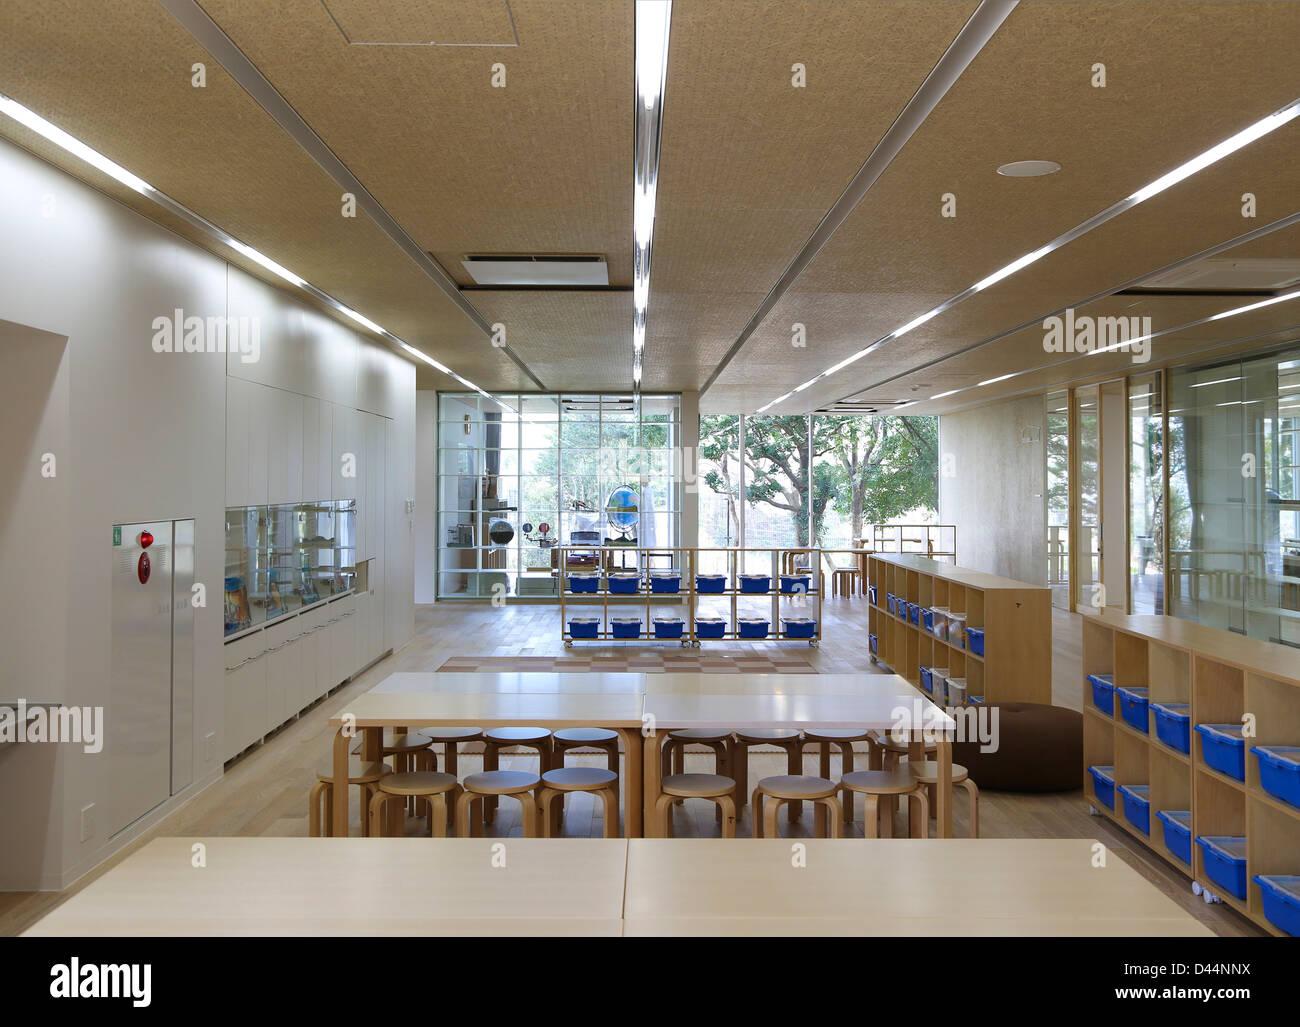 Teikyo University Elementary School, Tokyo, Japan. Architect: Kengo Kuma,  2012. Interior View Typical Classroom On Top Floor.